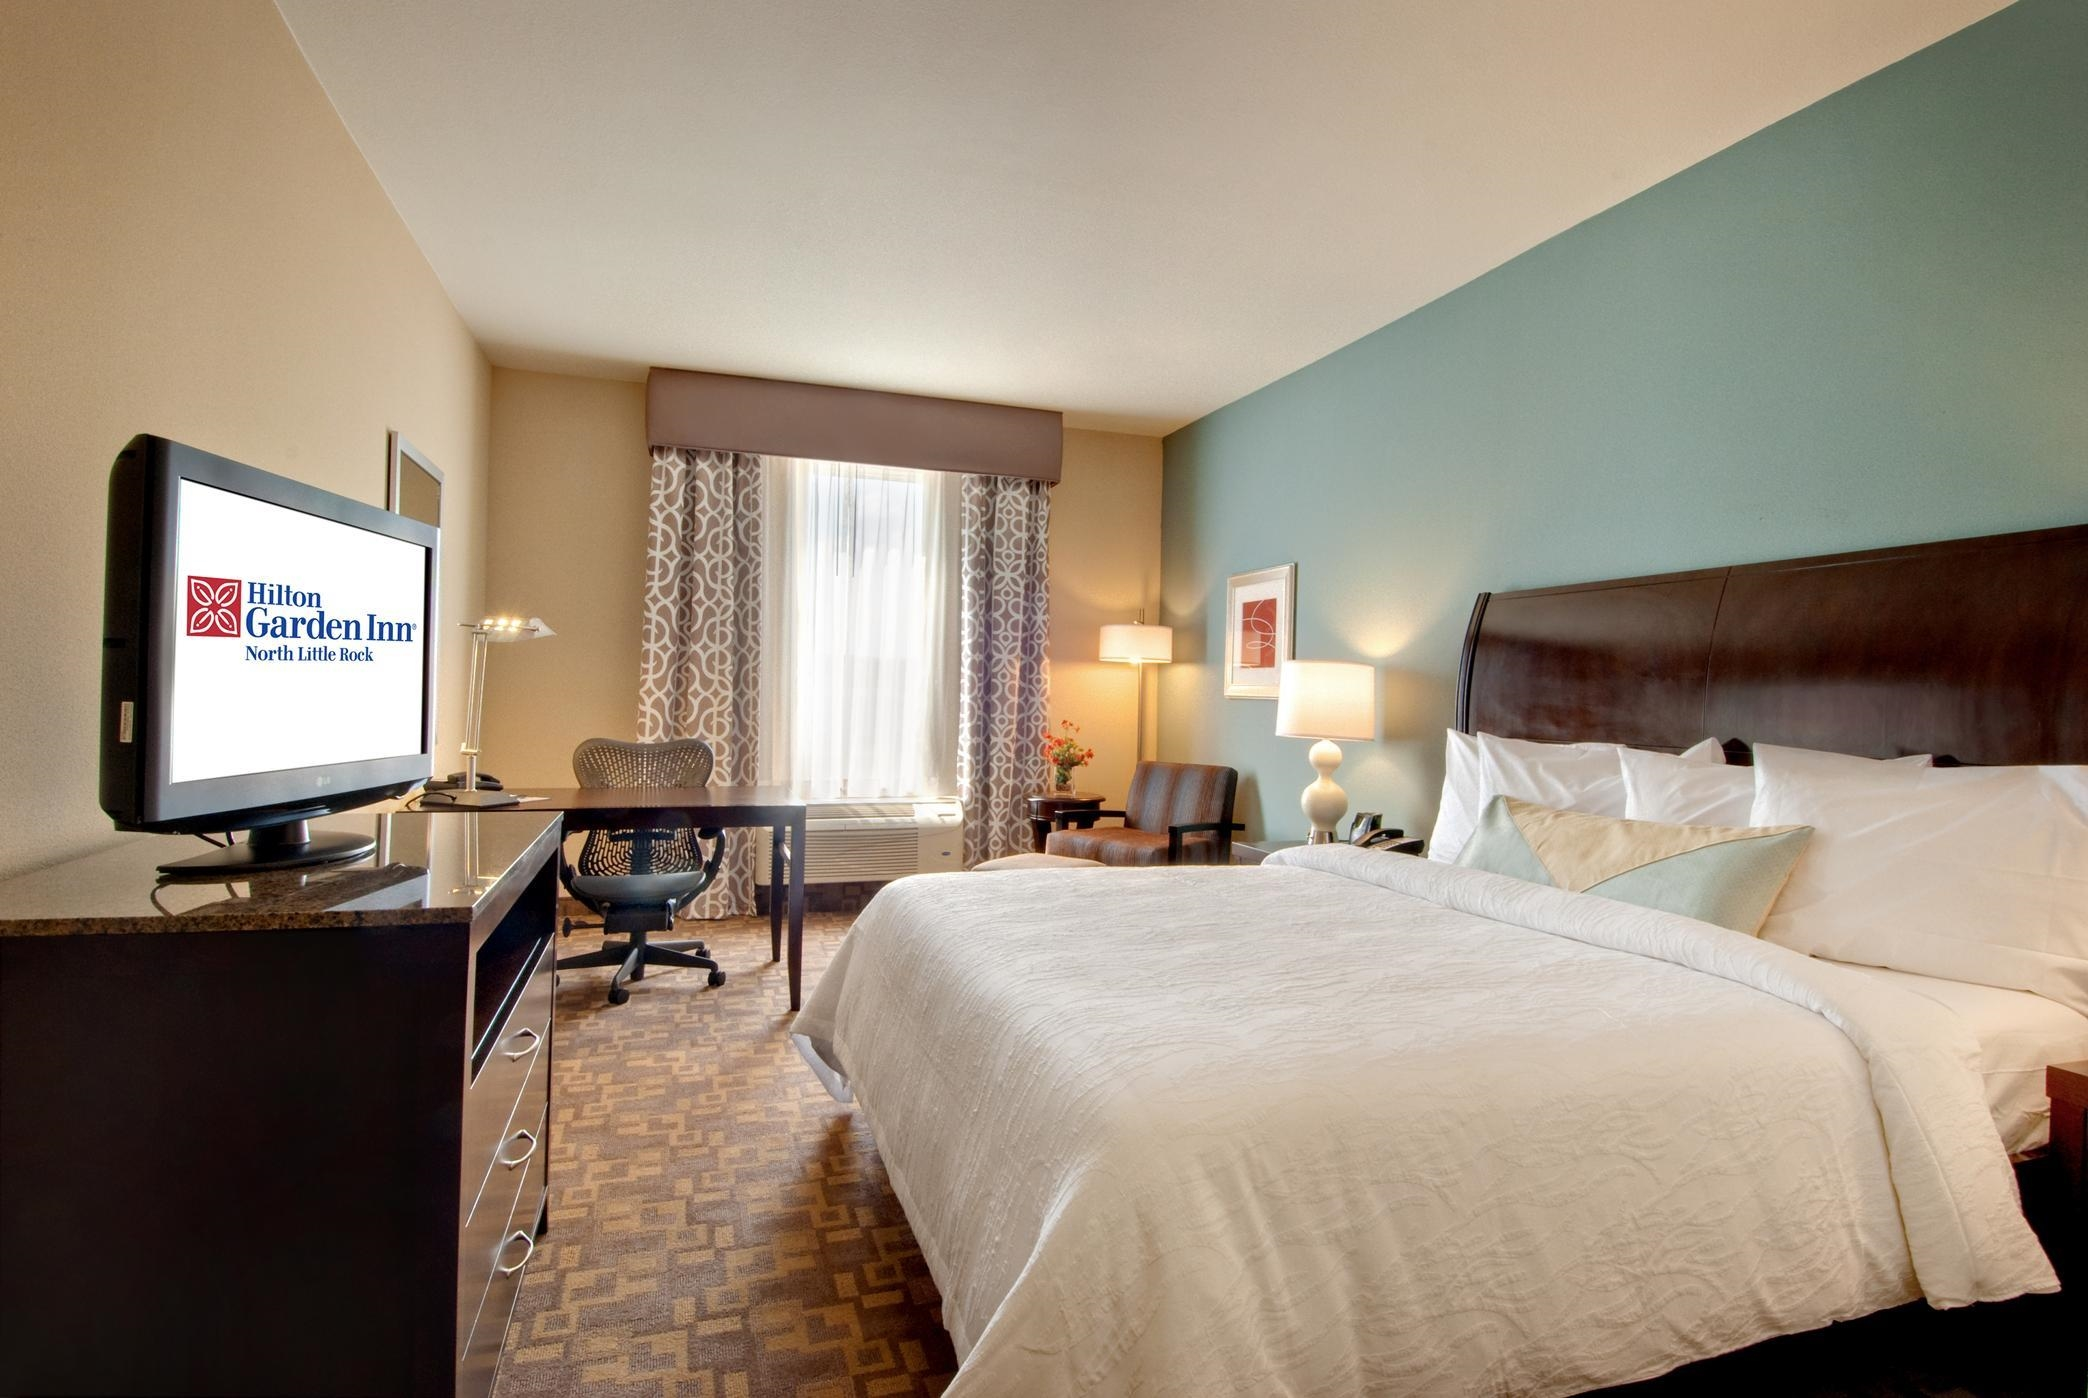 Hilton Garden Inn North Little Rock 4100 Glover Lane North Little Rock, AR  Hotels U0026 Motels   MapQuest